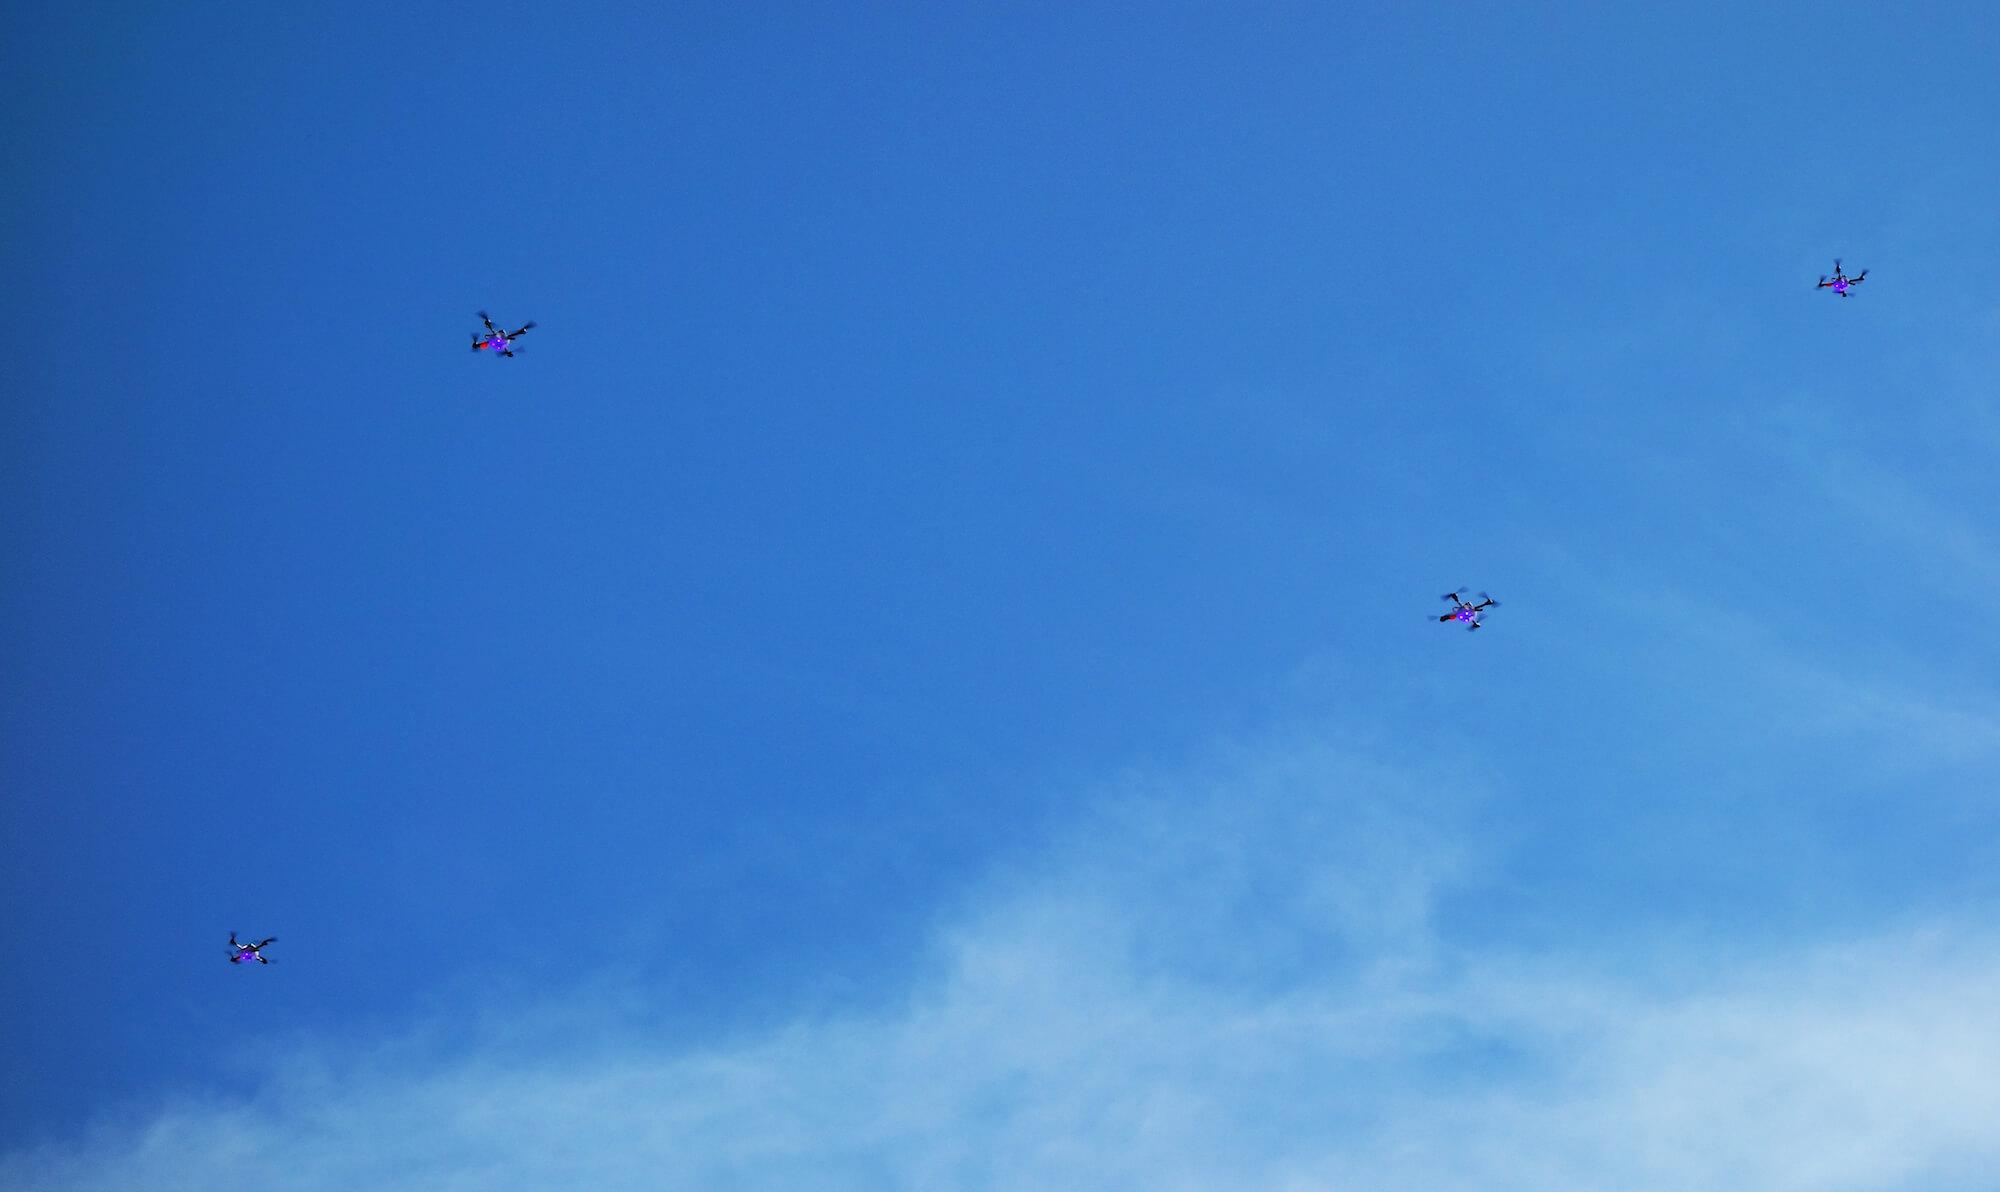 160923drone100_reh08.JPG